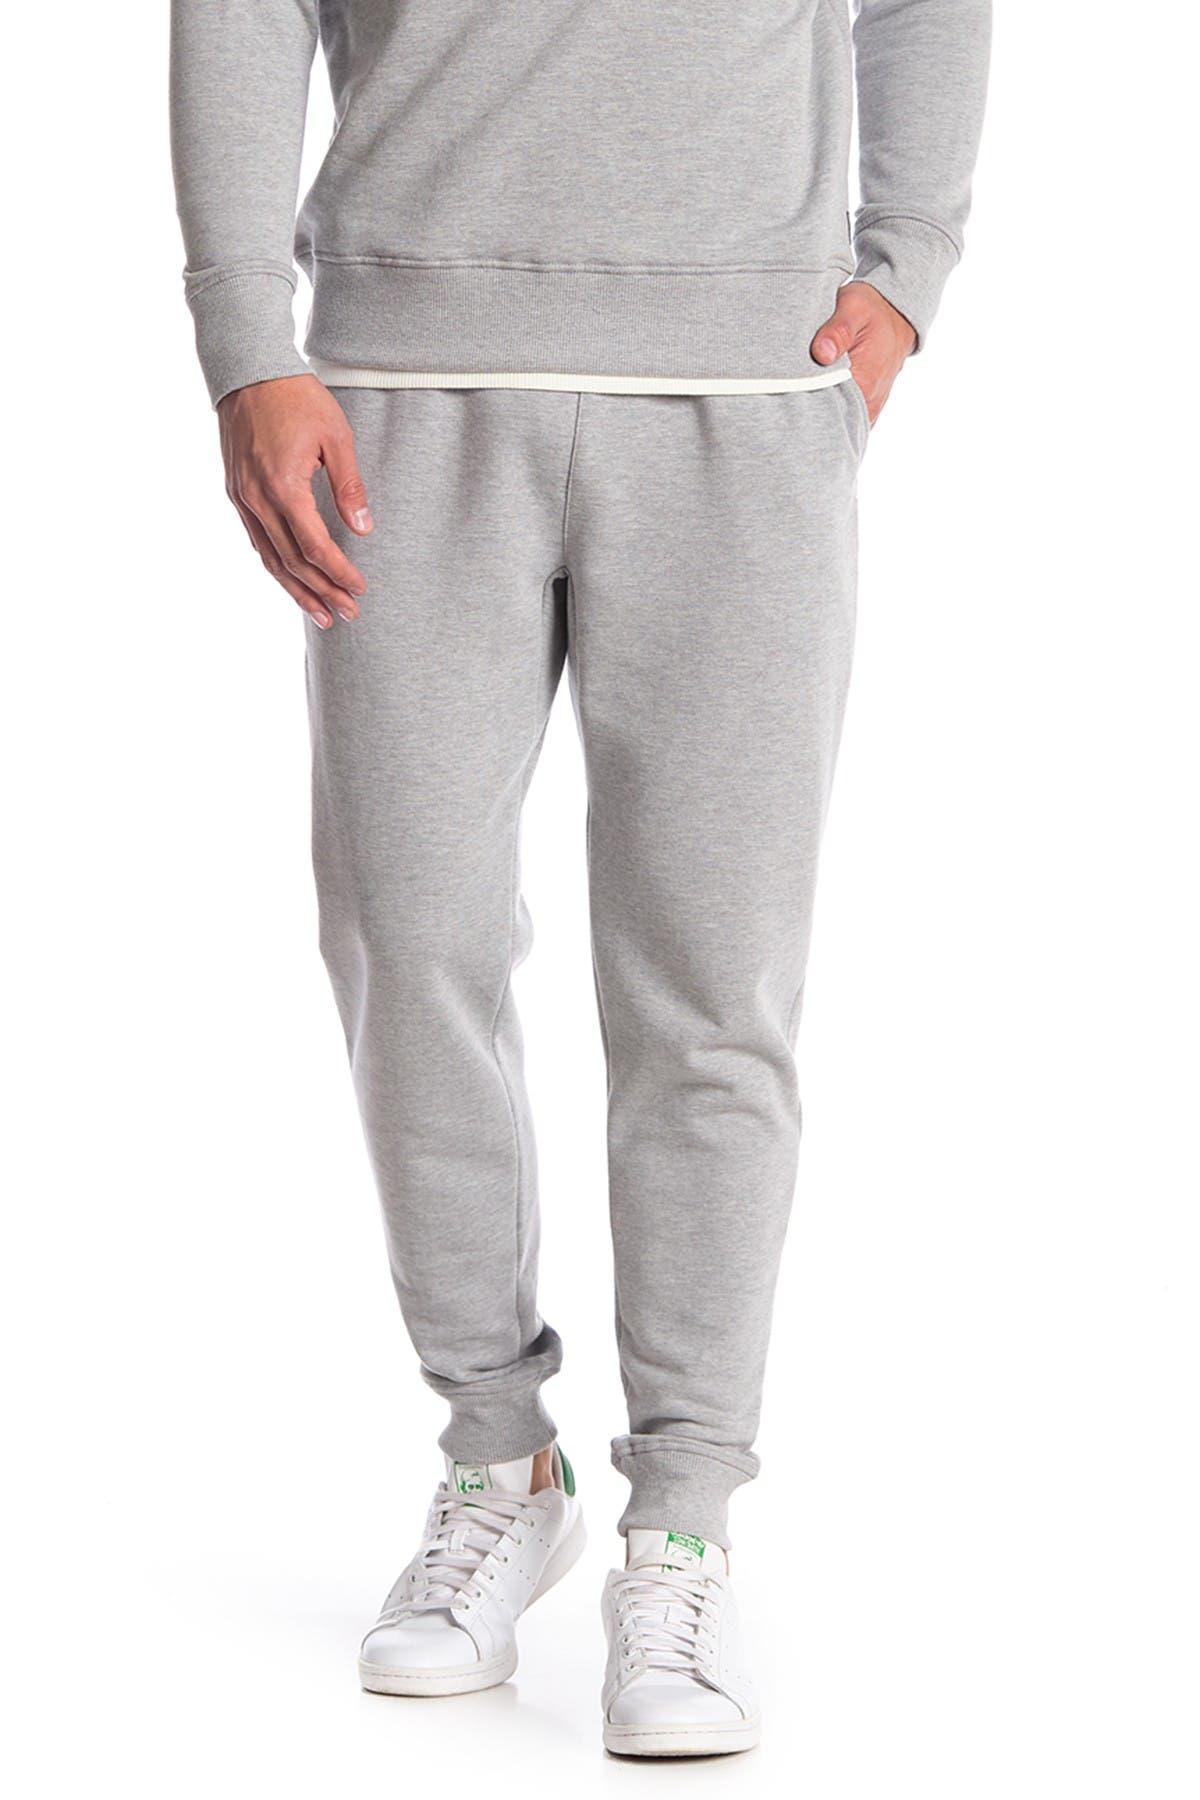 Image of Richer Poorer Ribbed Knit Sweatpants